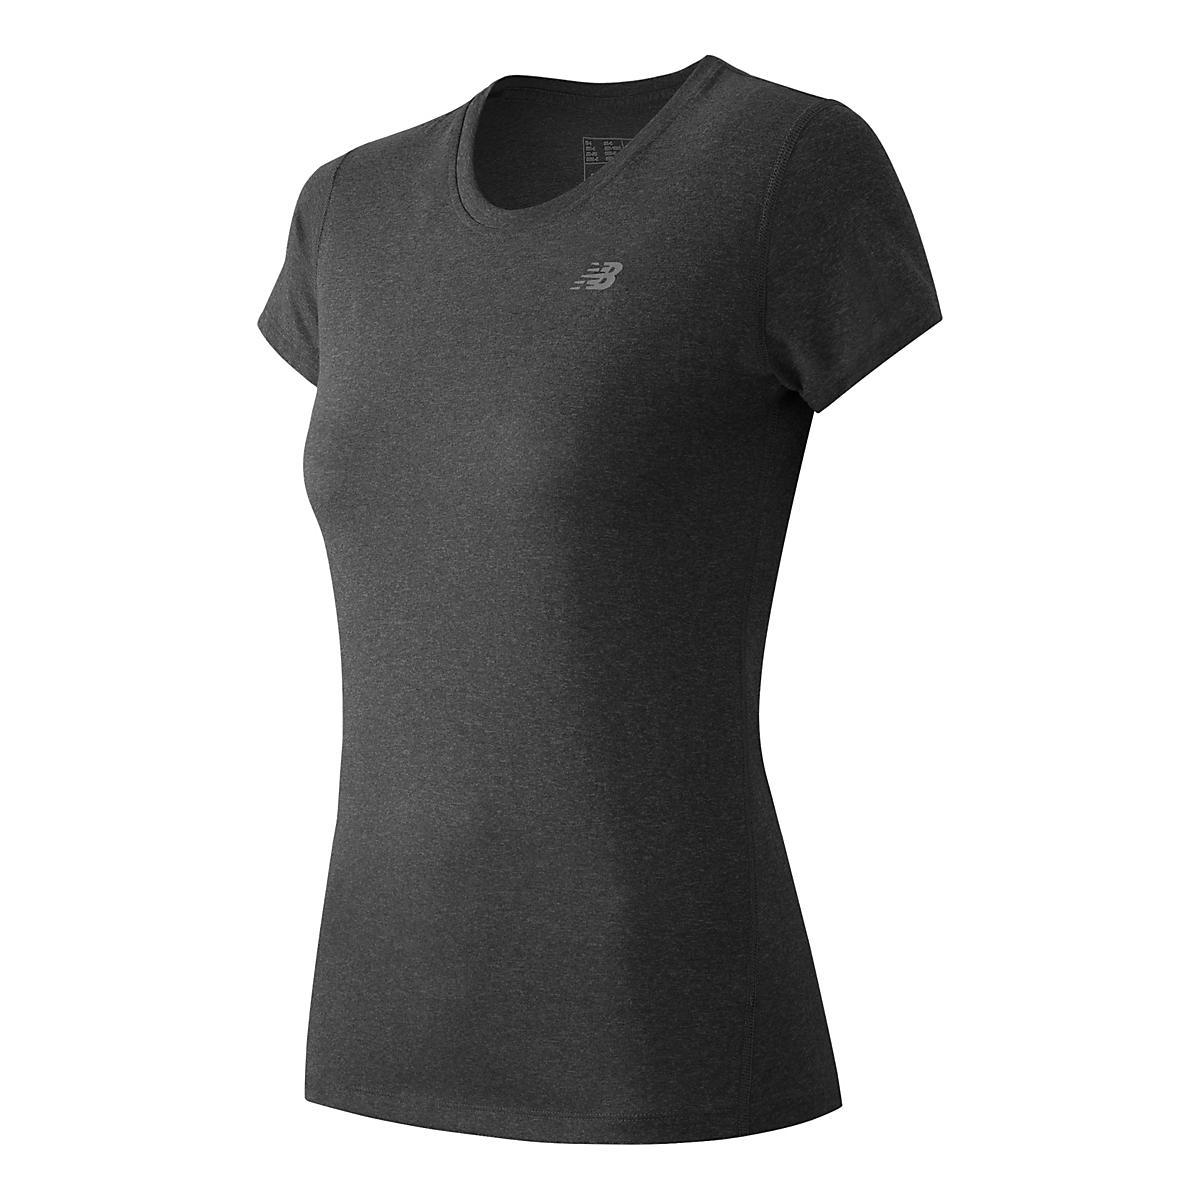 Women's New Balance�Heathered Short Sleeve Tee